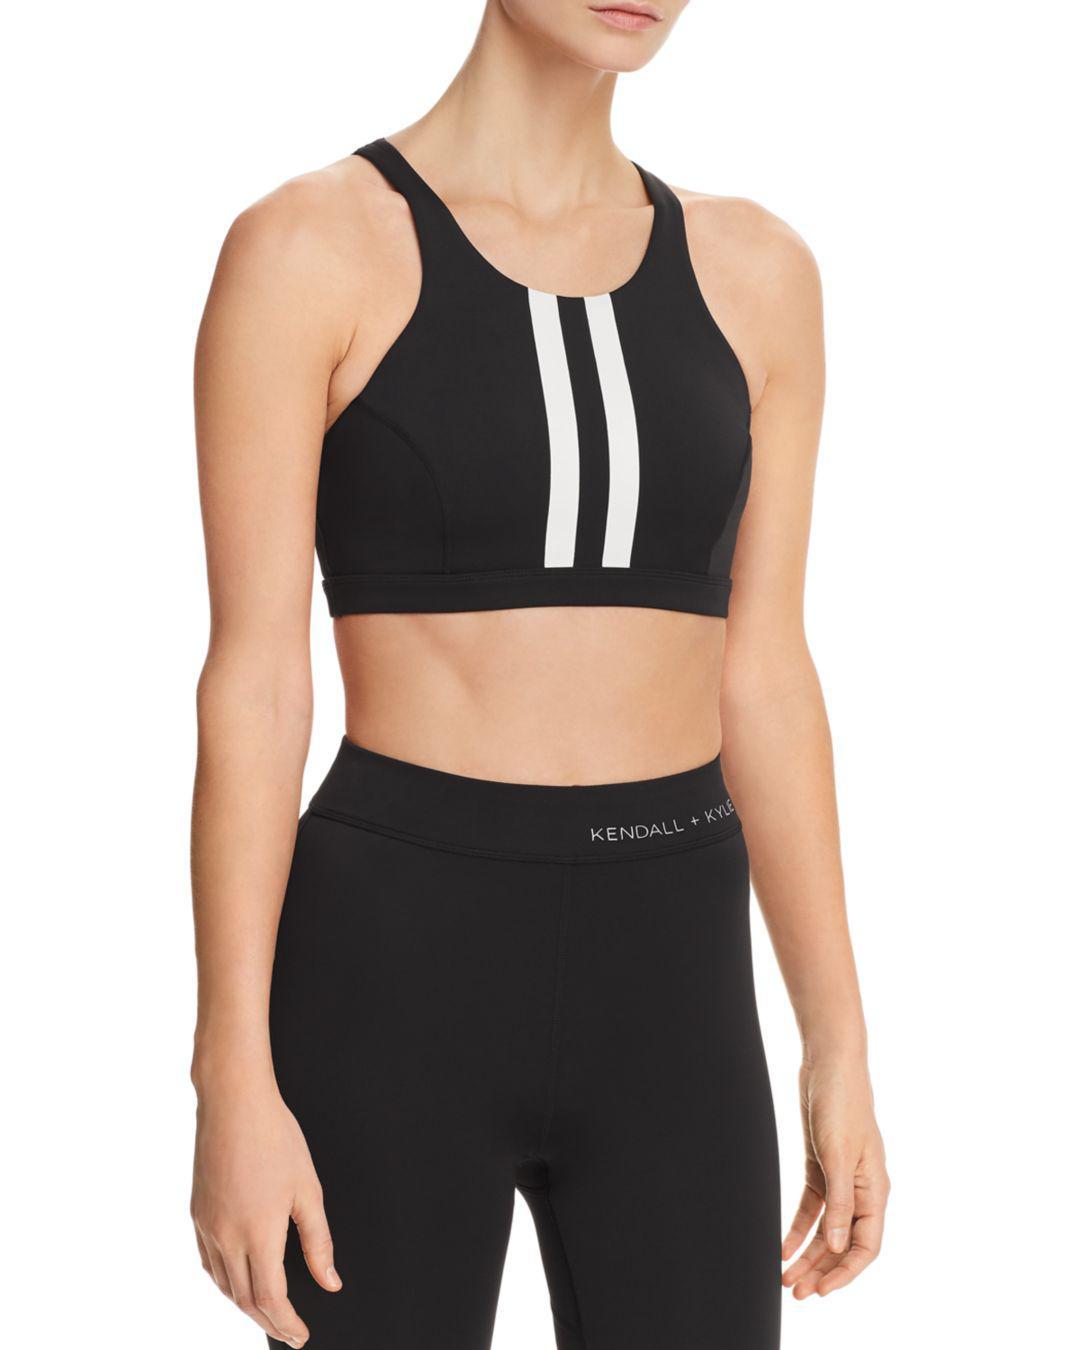 69e790b258 Kendall + Kylie Racing Stripe Sports Bra in Black - Lyst